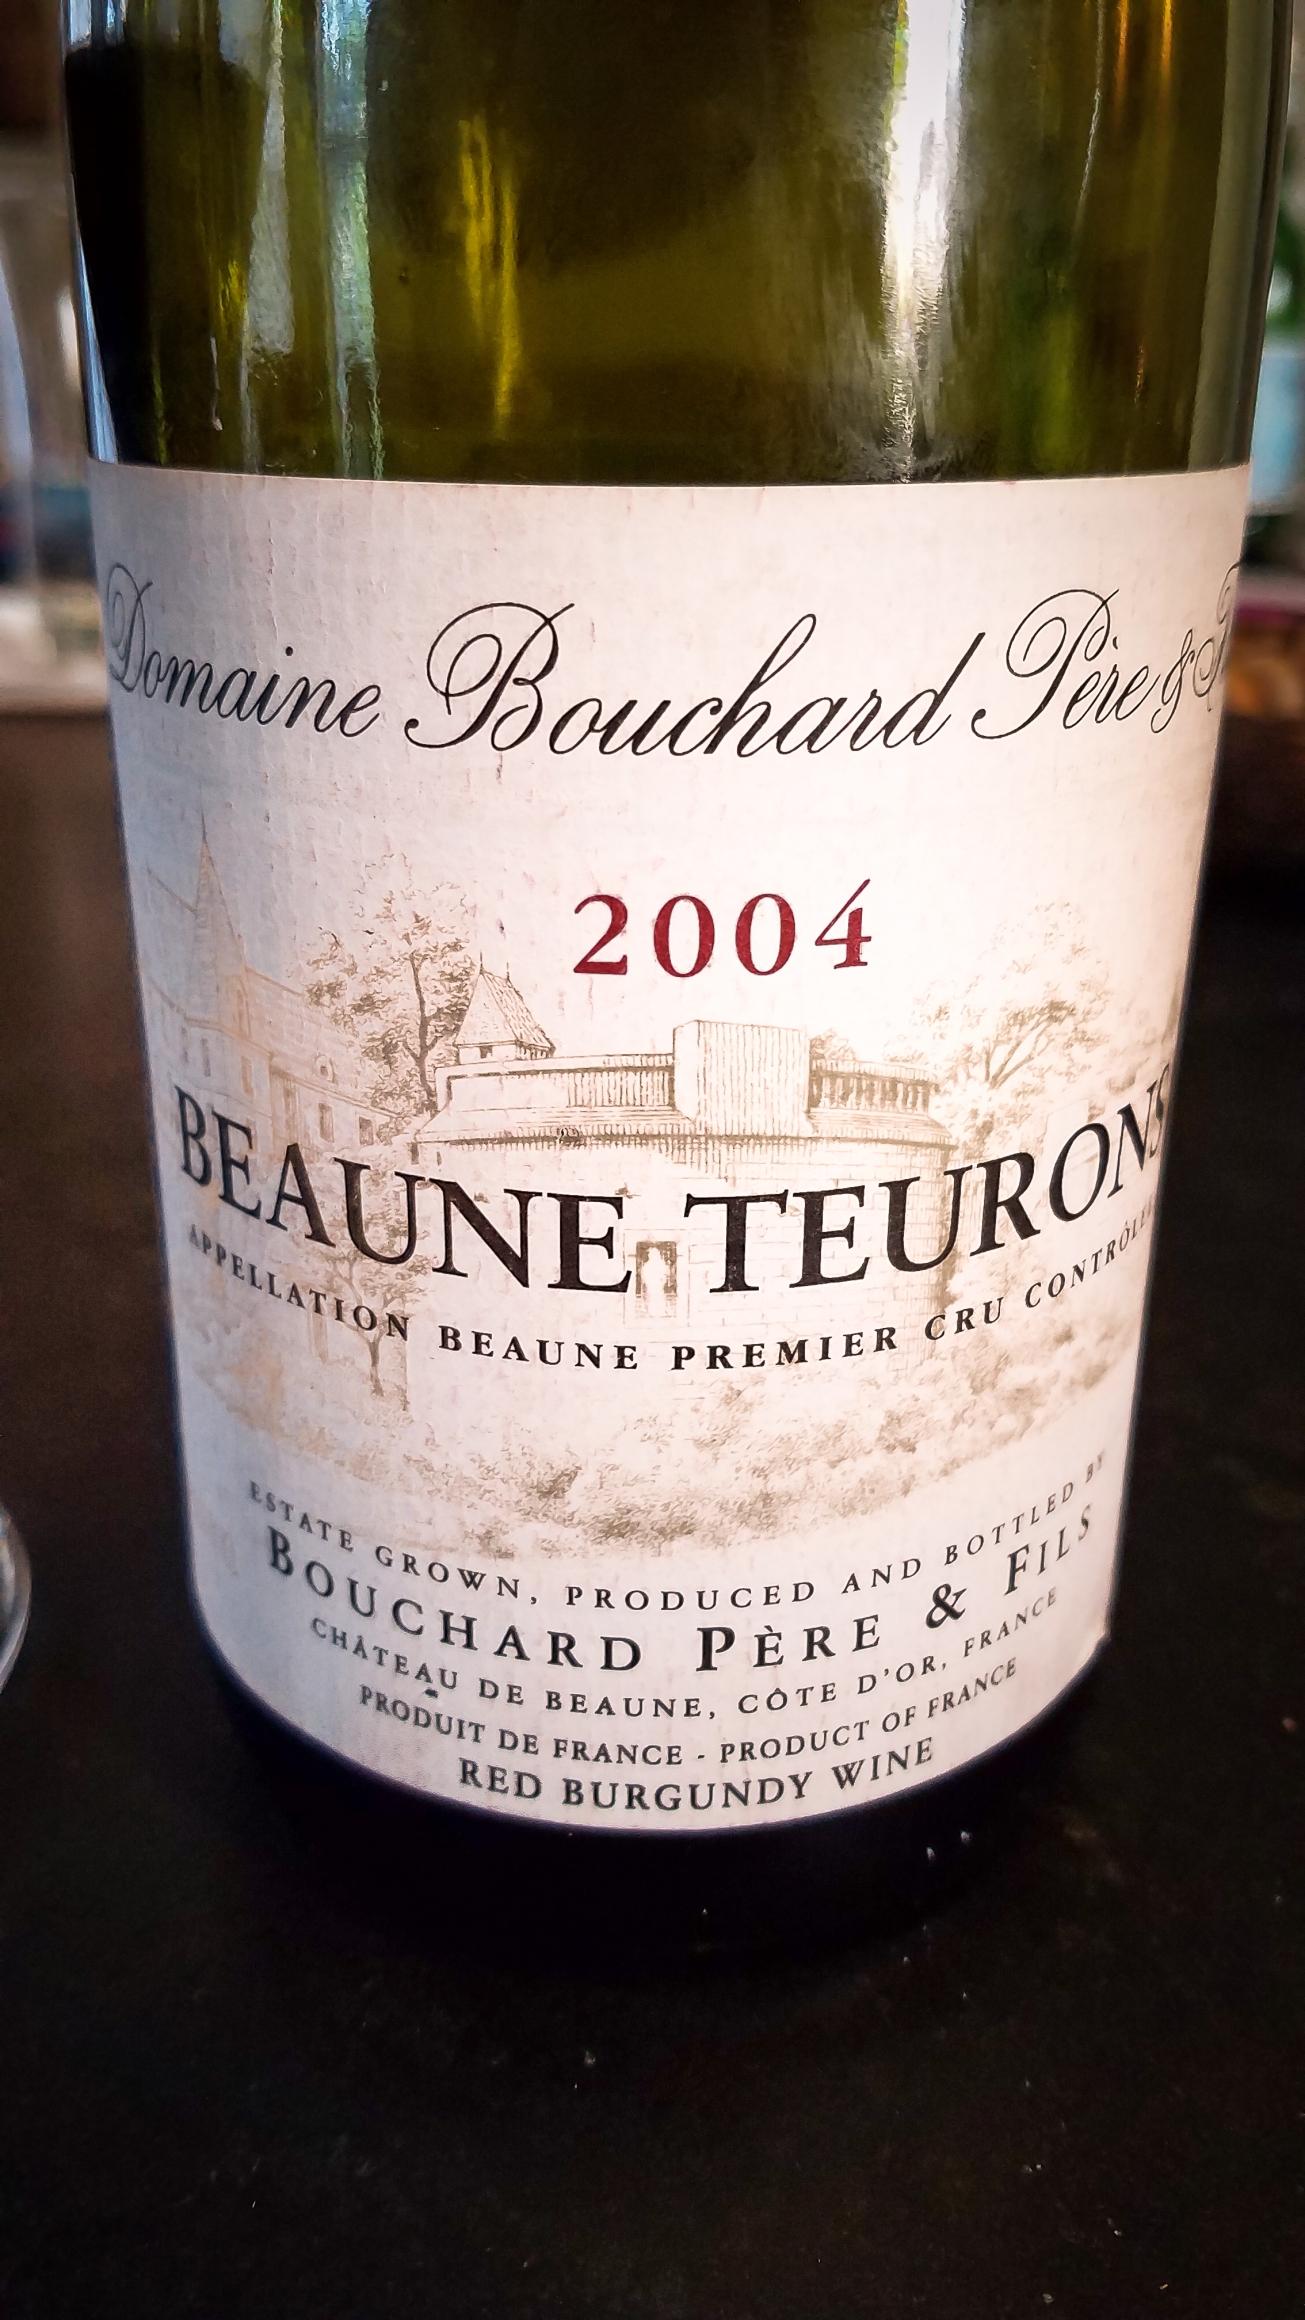 2004 Bouchard Père et Fils Beaune 1er Cru Teurons